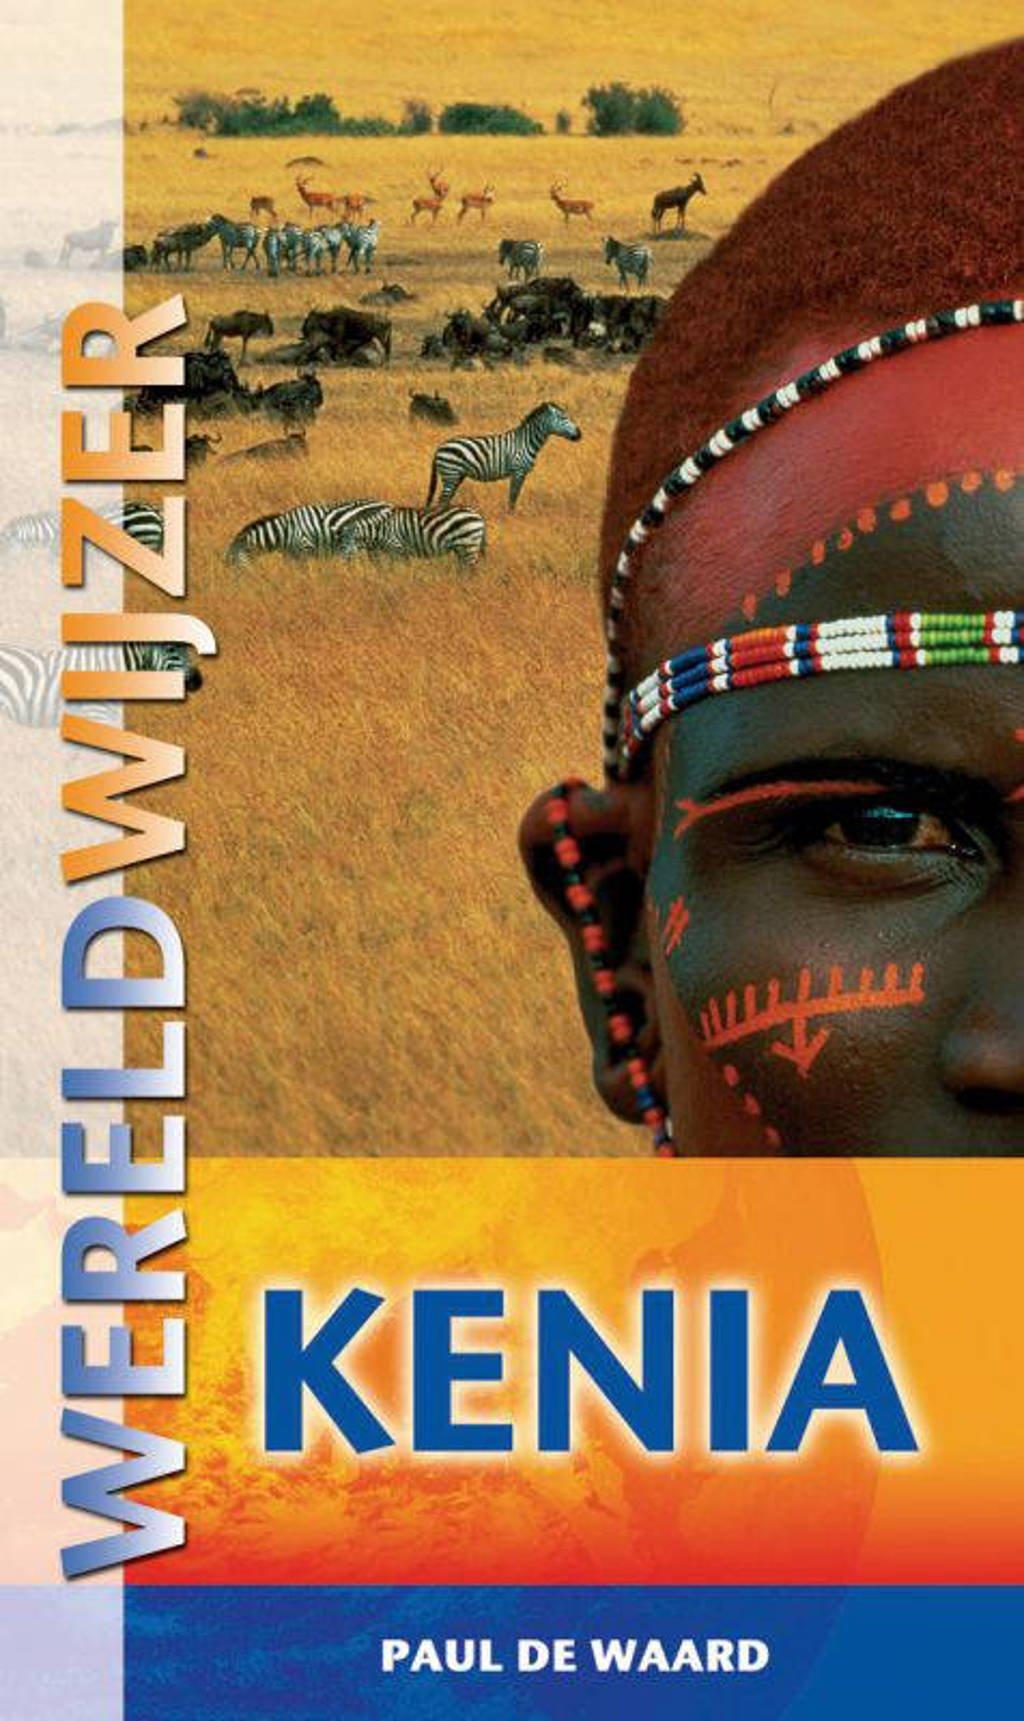 Wereldwijzer: Kenia - Paul de Waard